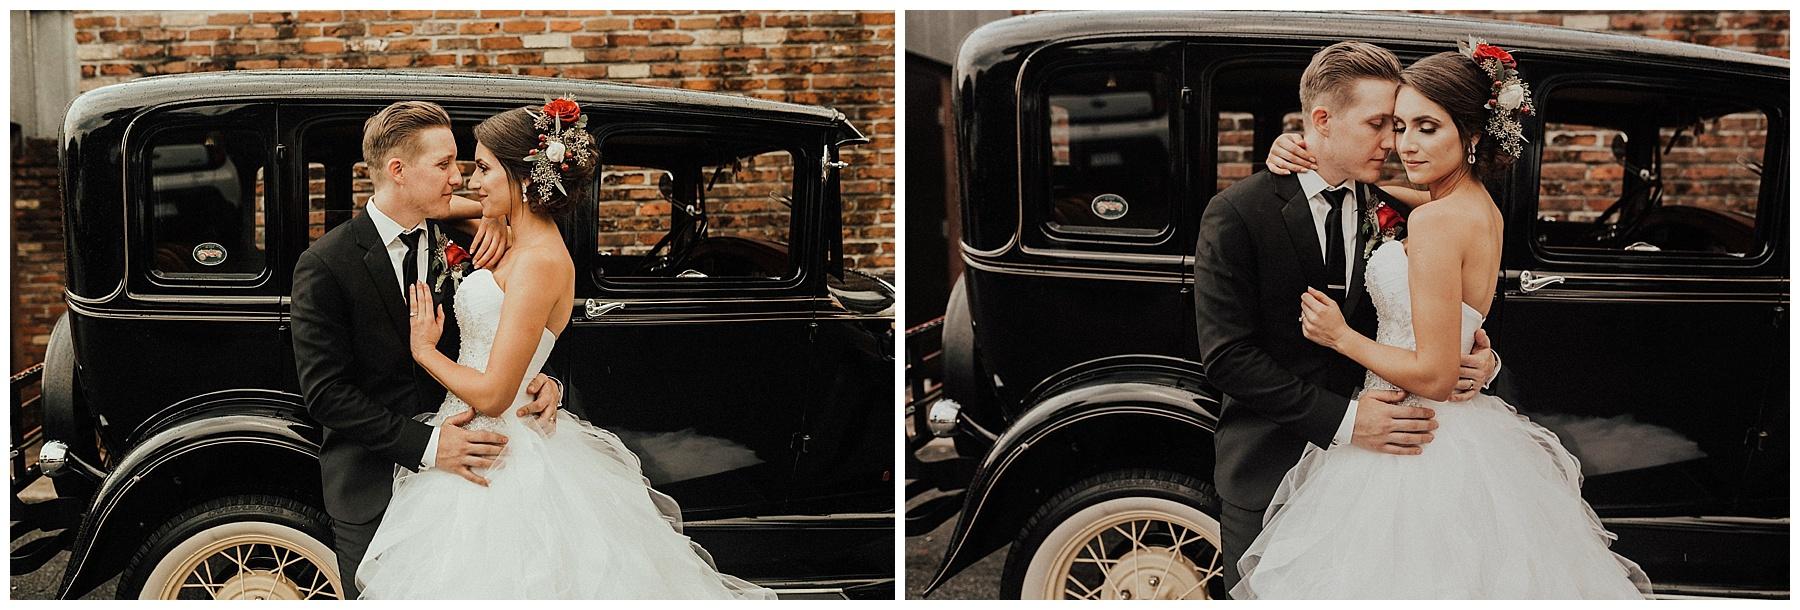 YBOR Wedding Tampa Wedding Photographer-99.jpg